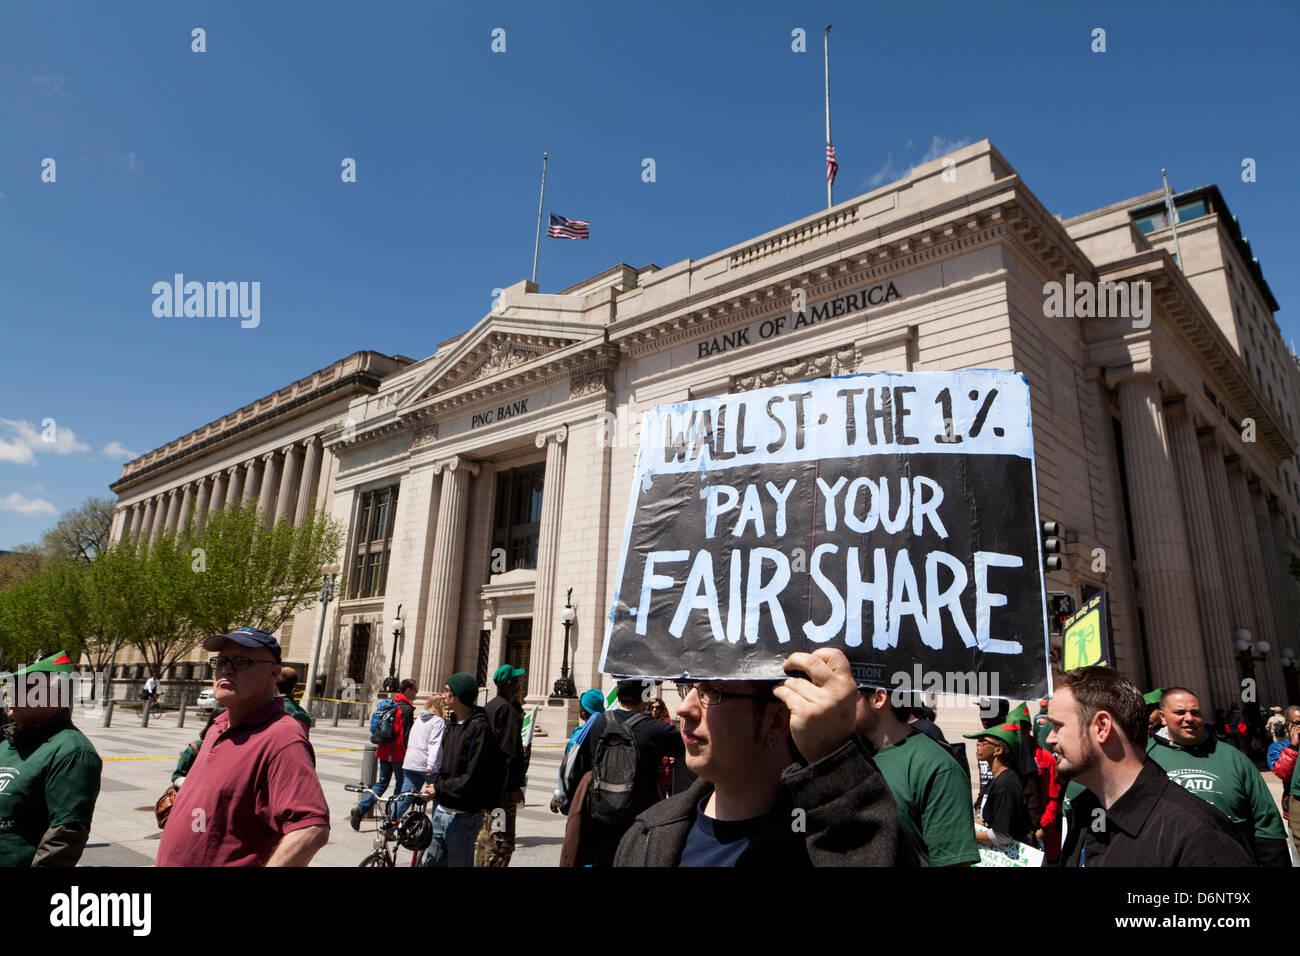 Robin-Hood-Steuer Anhänger Kundgebung in Washington DC Stockbild